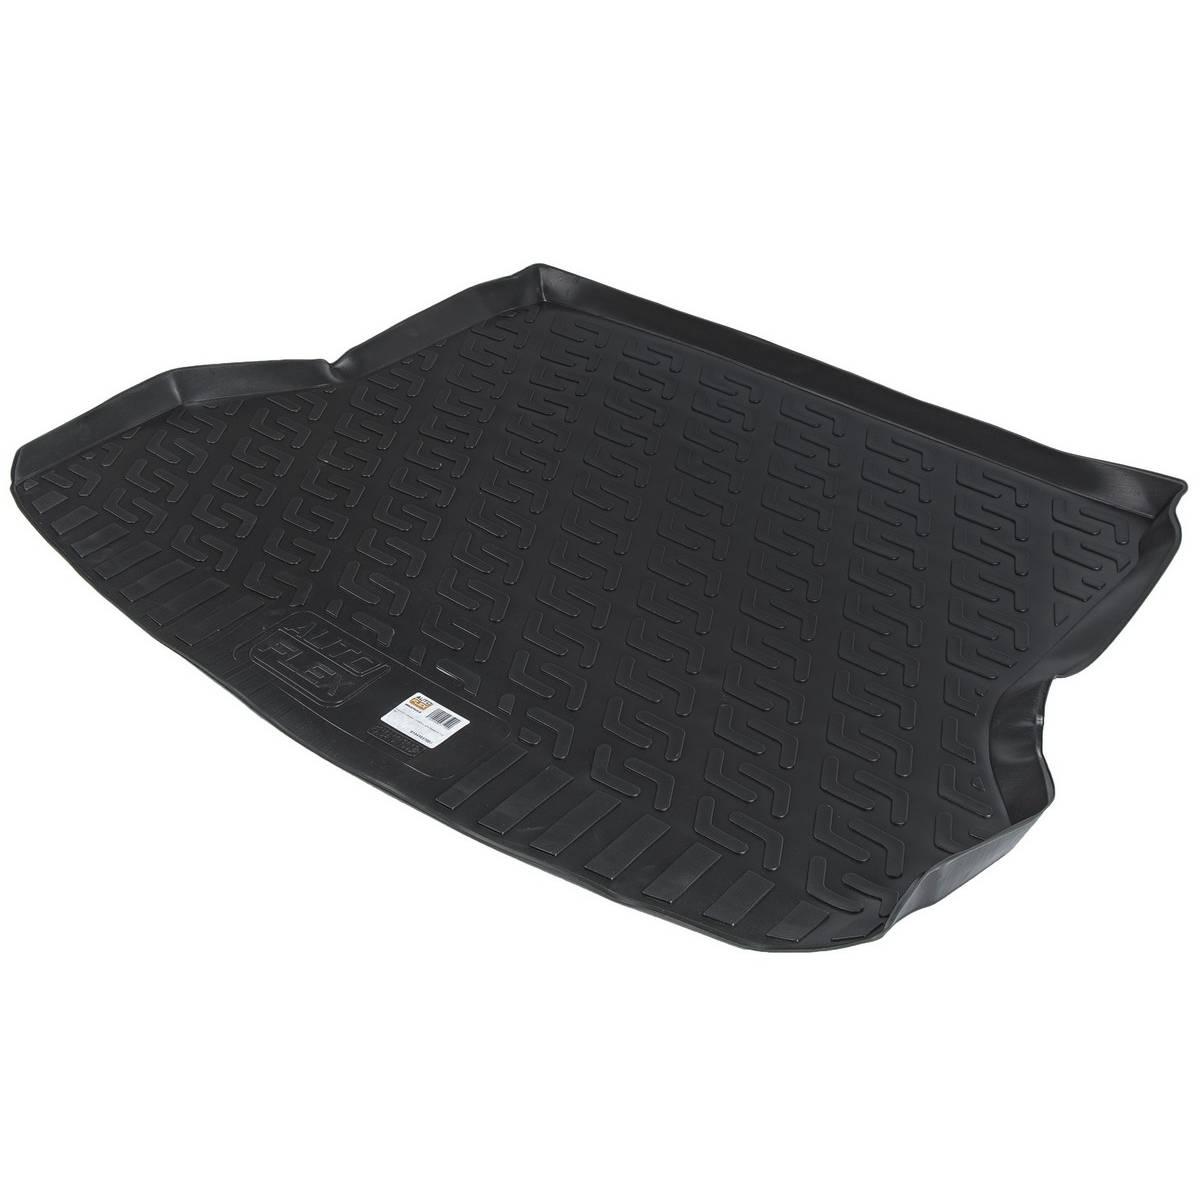 цена Mat rear trunk lid cover trim for Nissan X-Trail T32 2015-2018 2018-> polyurethane [Autoflex 91041017003] в интернет-магазинах